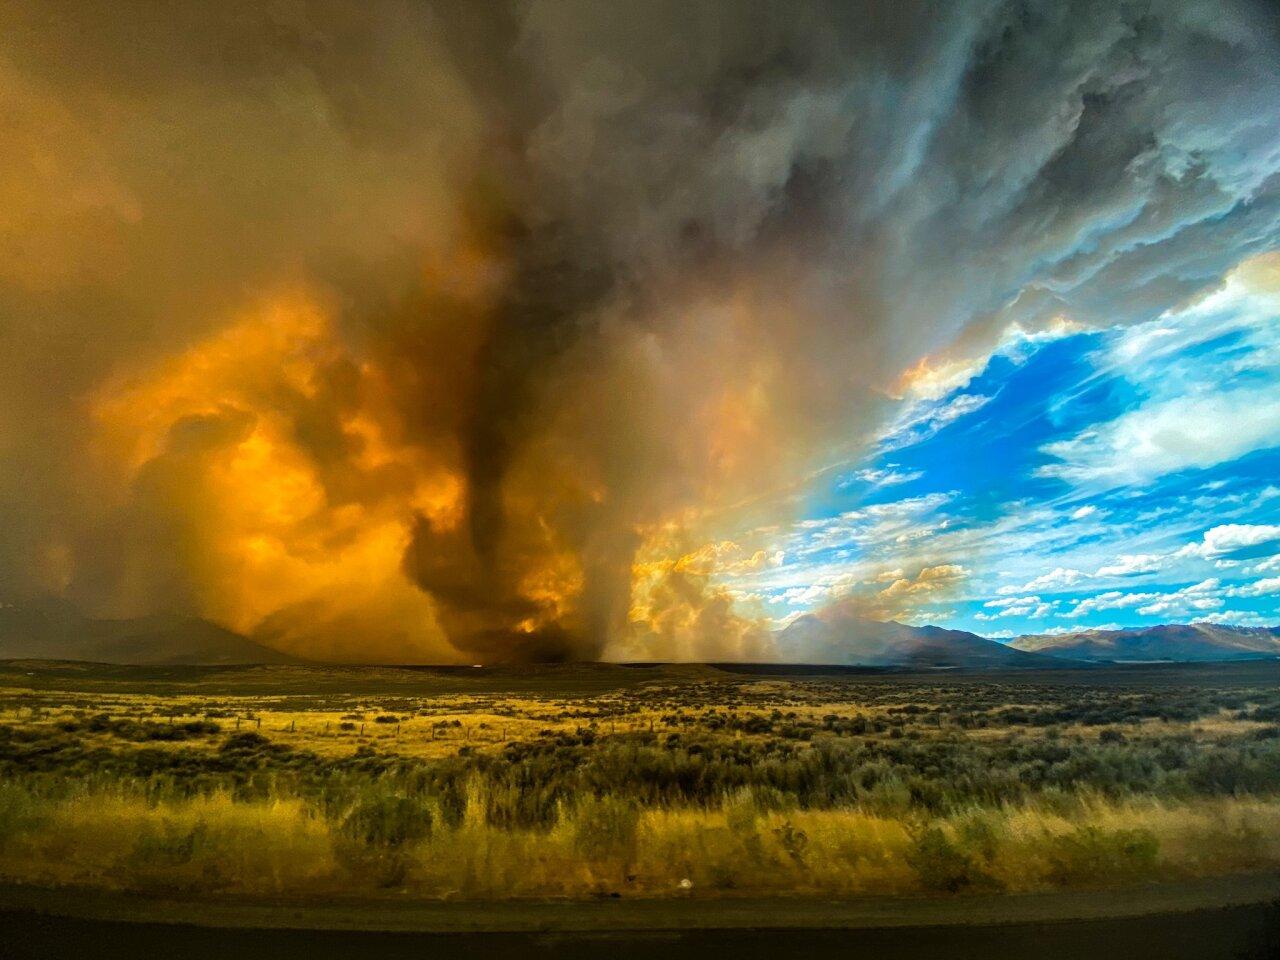 Fire_Tornado_Loyalton_fire_SOURCE_KateLynn and Jordan Hewlett.jpeg